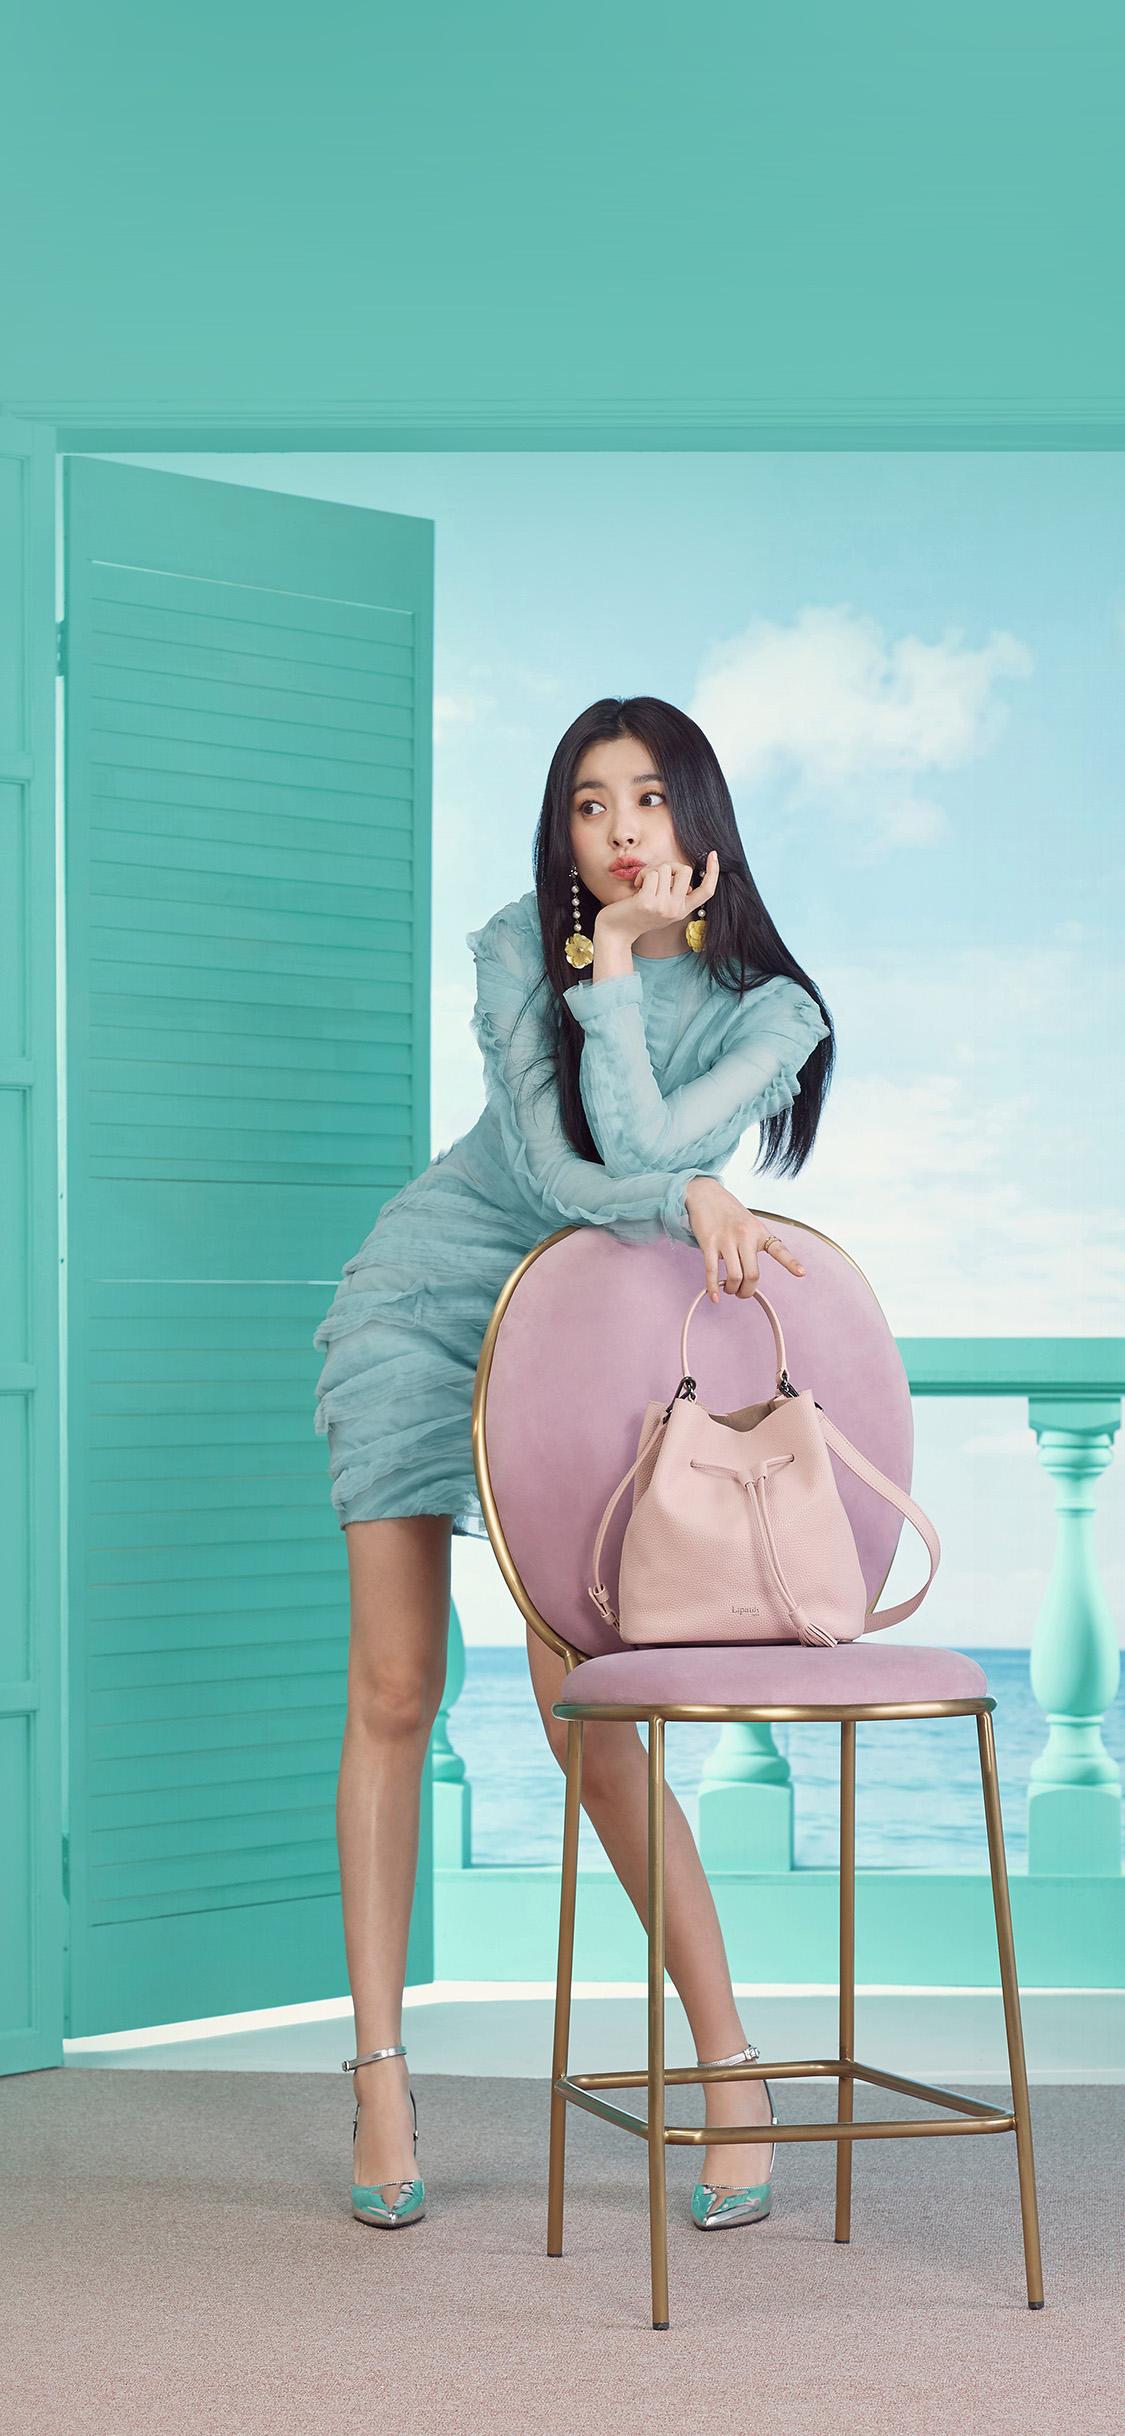 iPhonexpapers.com-Apple-iPhone-wallpaper-hp64-hyojoo-girl-kpop-asian-green-spring-dress